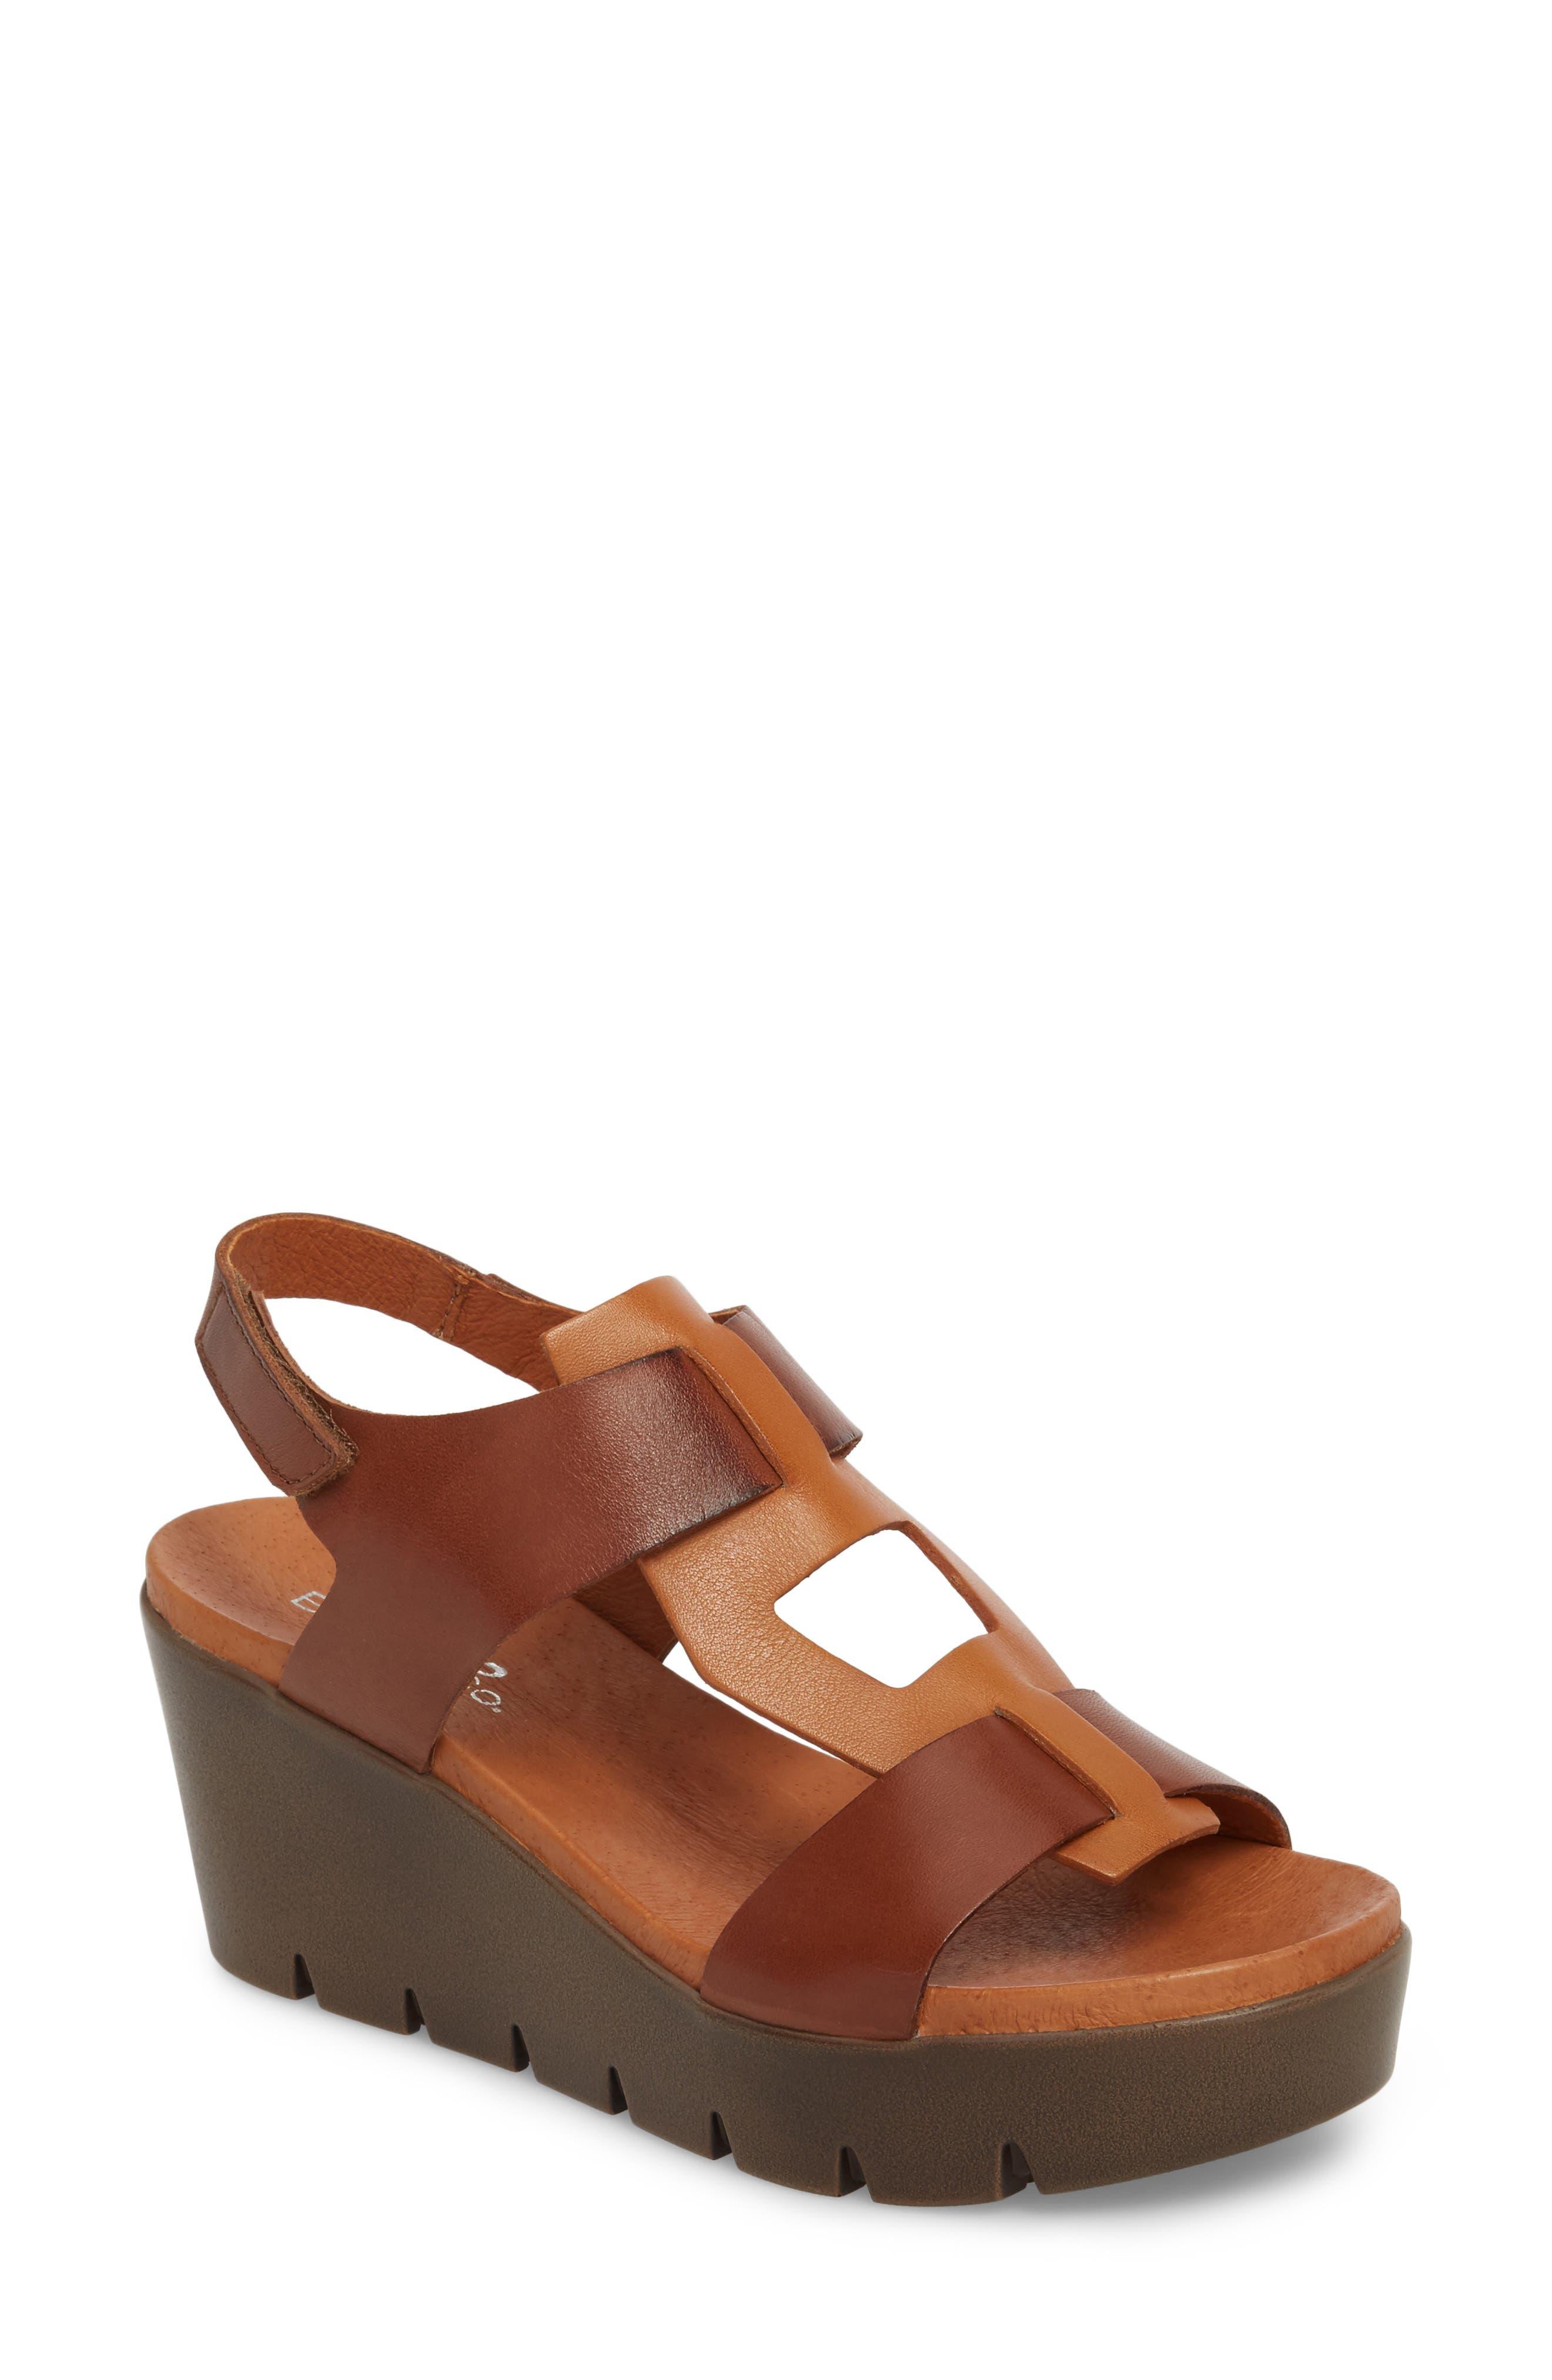 Somo Platform Wedge Sandal,                             Main thumbnail 1, color,                             Cognac/ Camel Leather